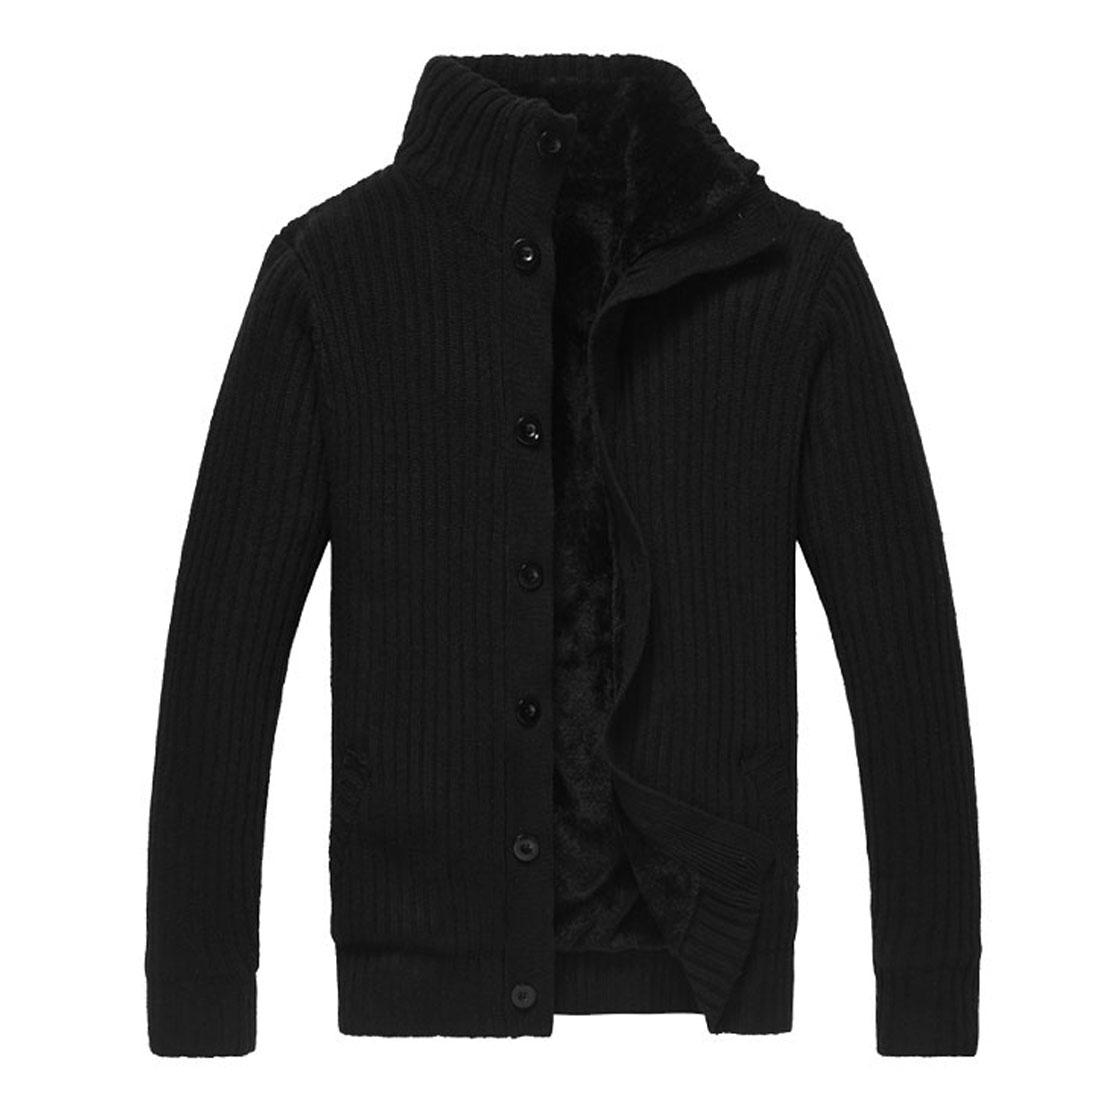 Men Black Button Closure Front Decorative Pockets Front Textured Winter Cozy Sweate L